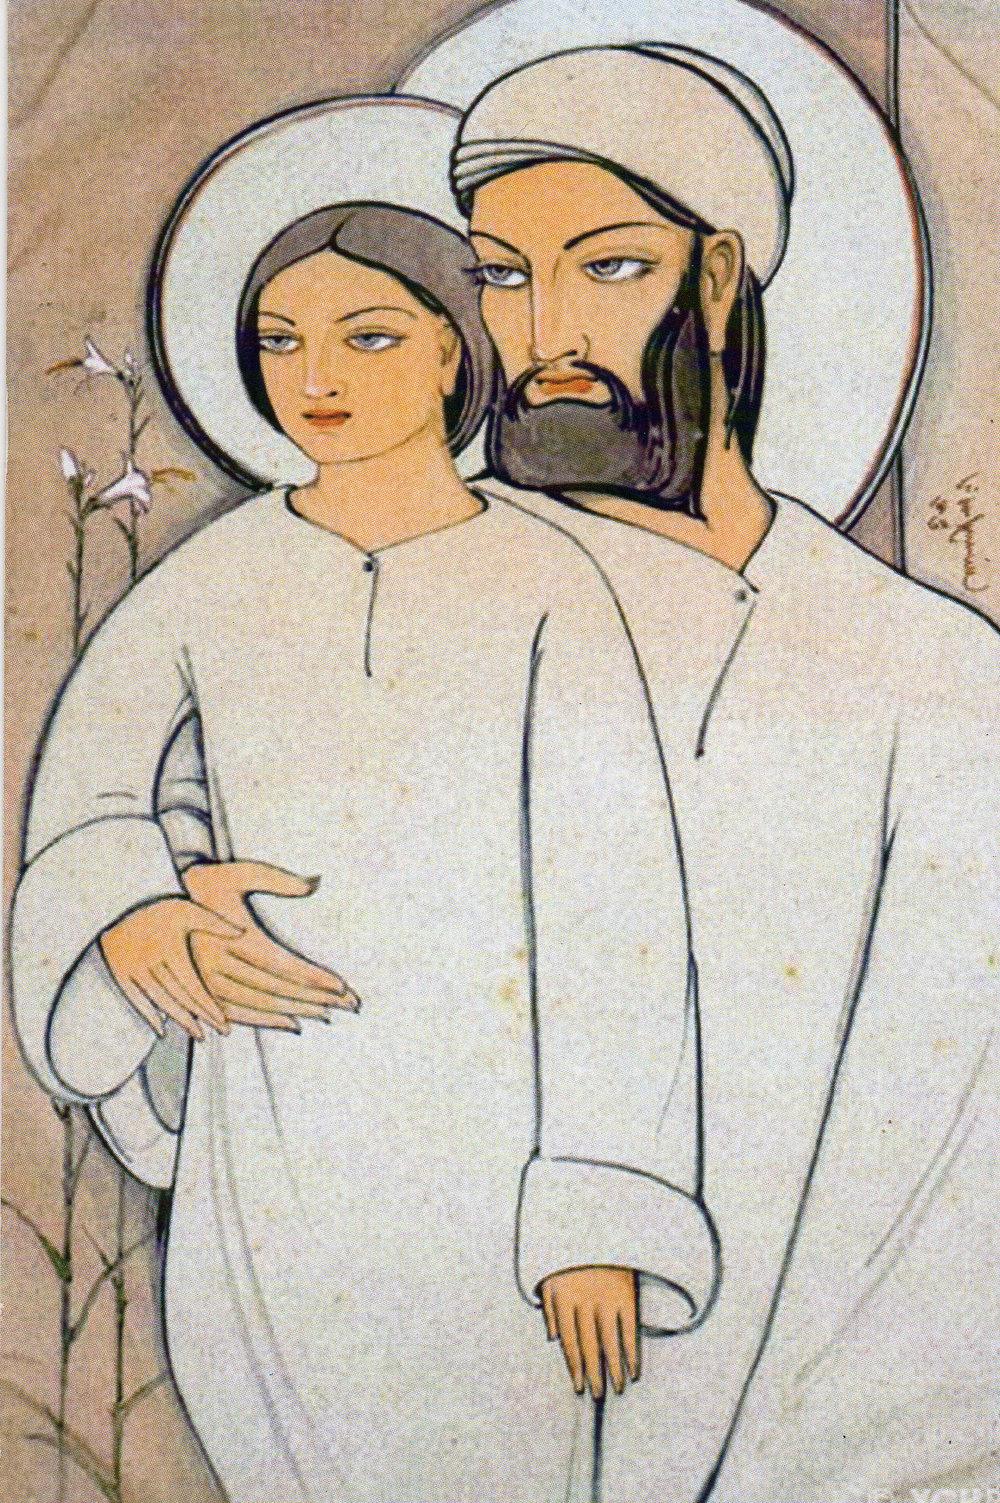 Yessonda represented as Jesus c. 1960-1965